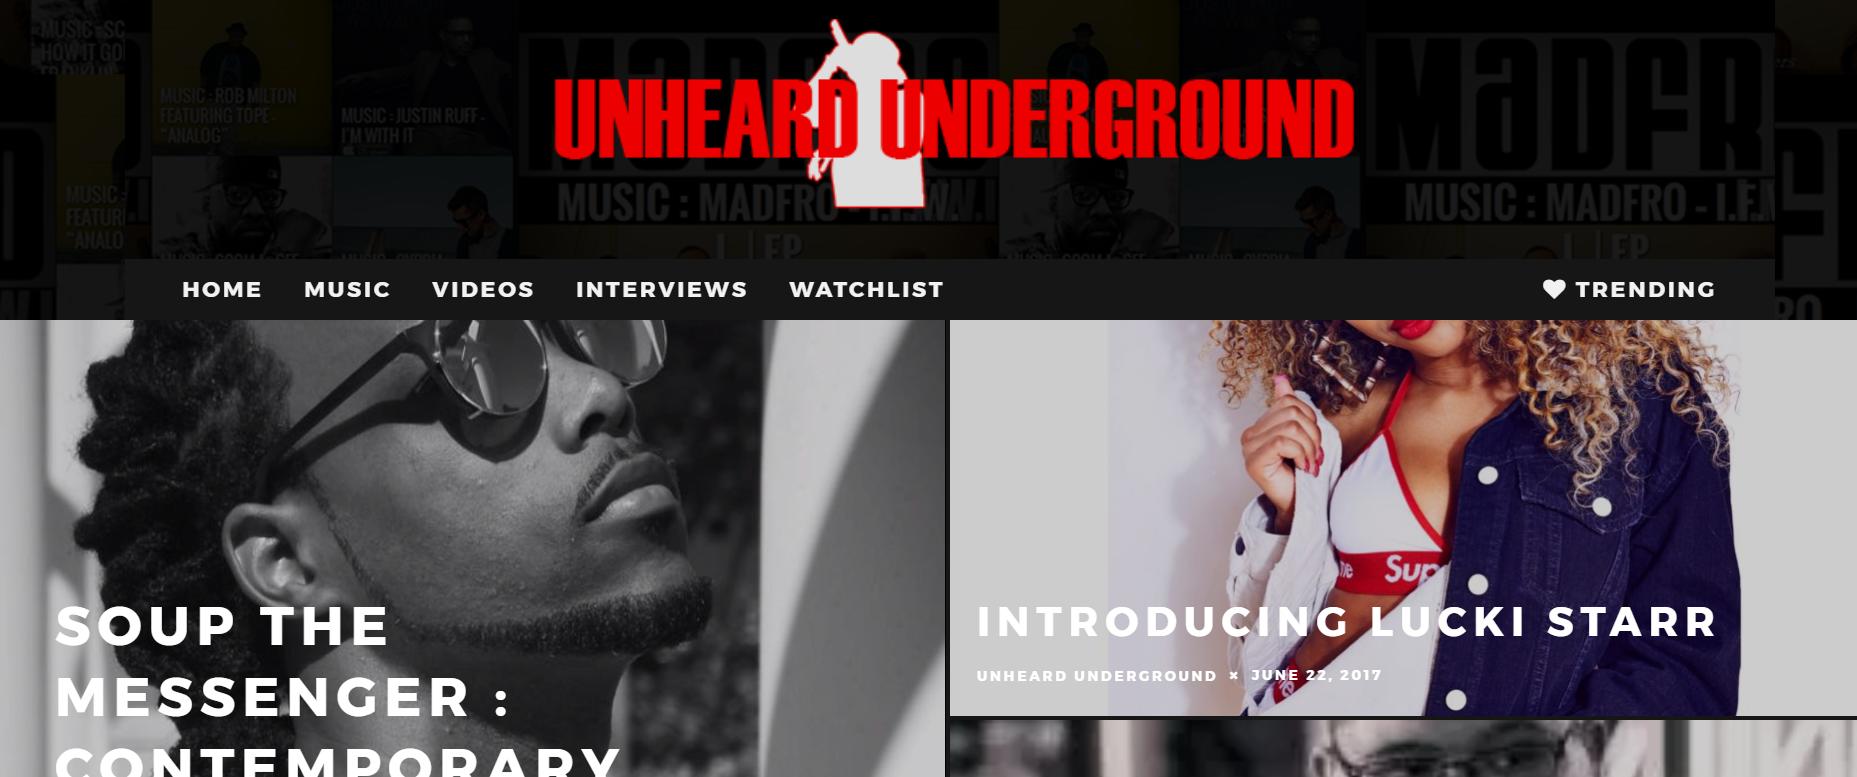 Unheard Underground Logo